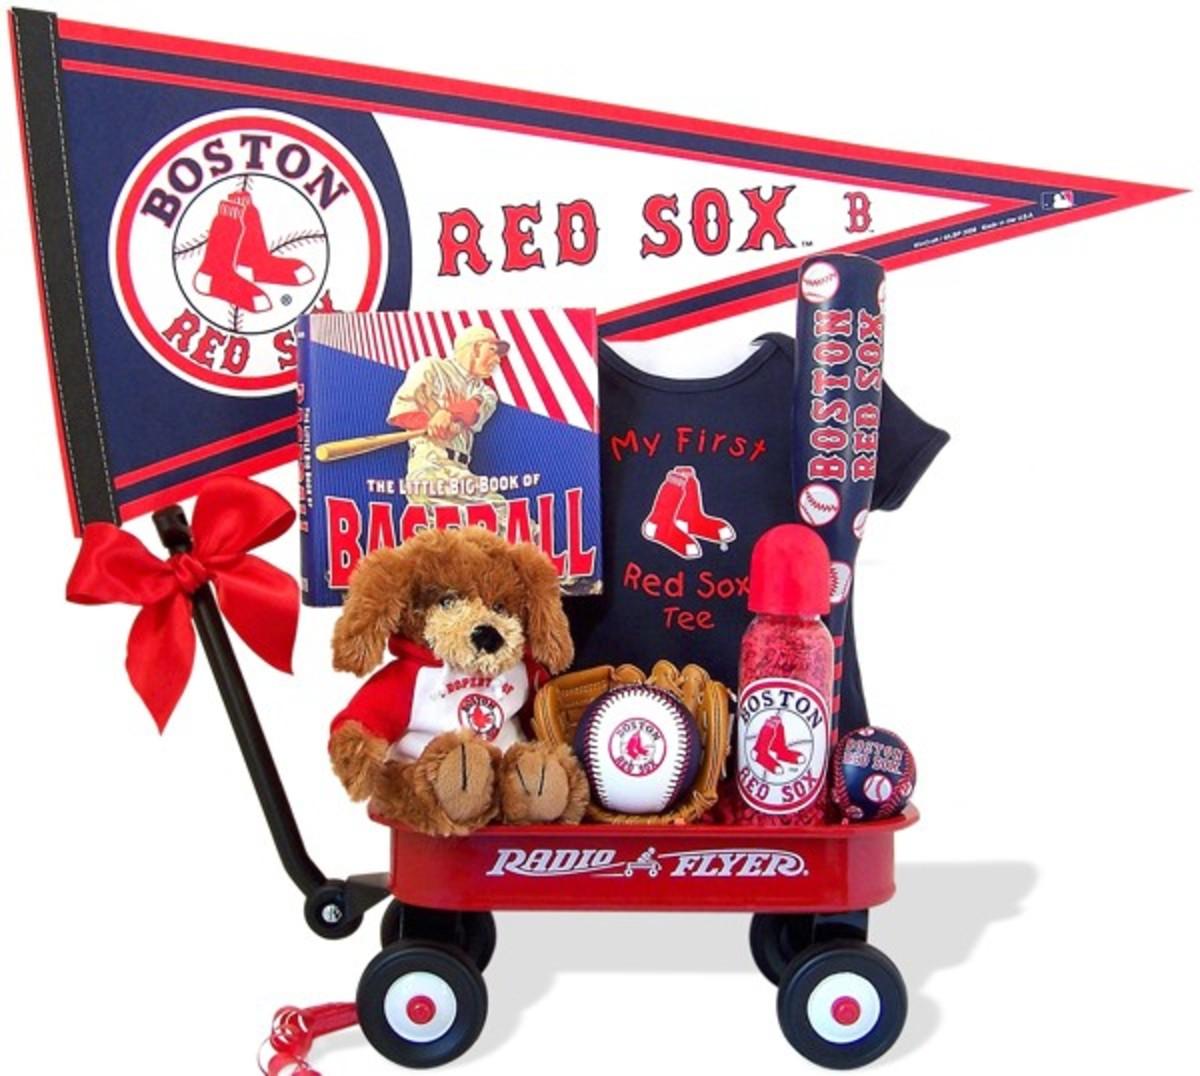 Boston Red Sox Baseball Wagon for Boys